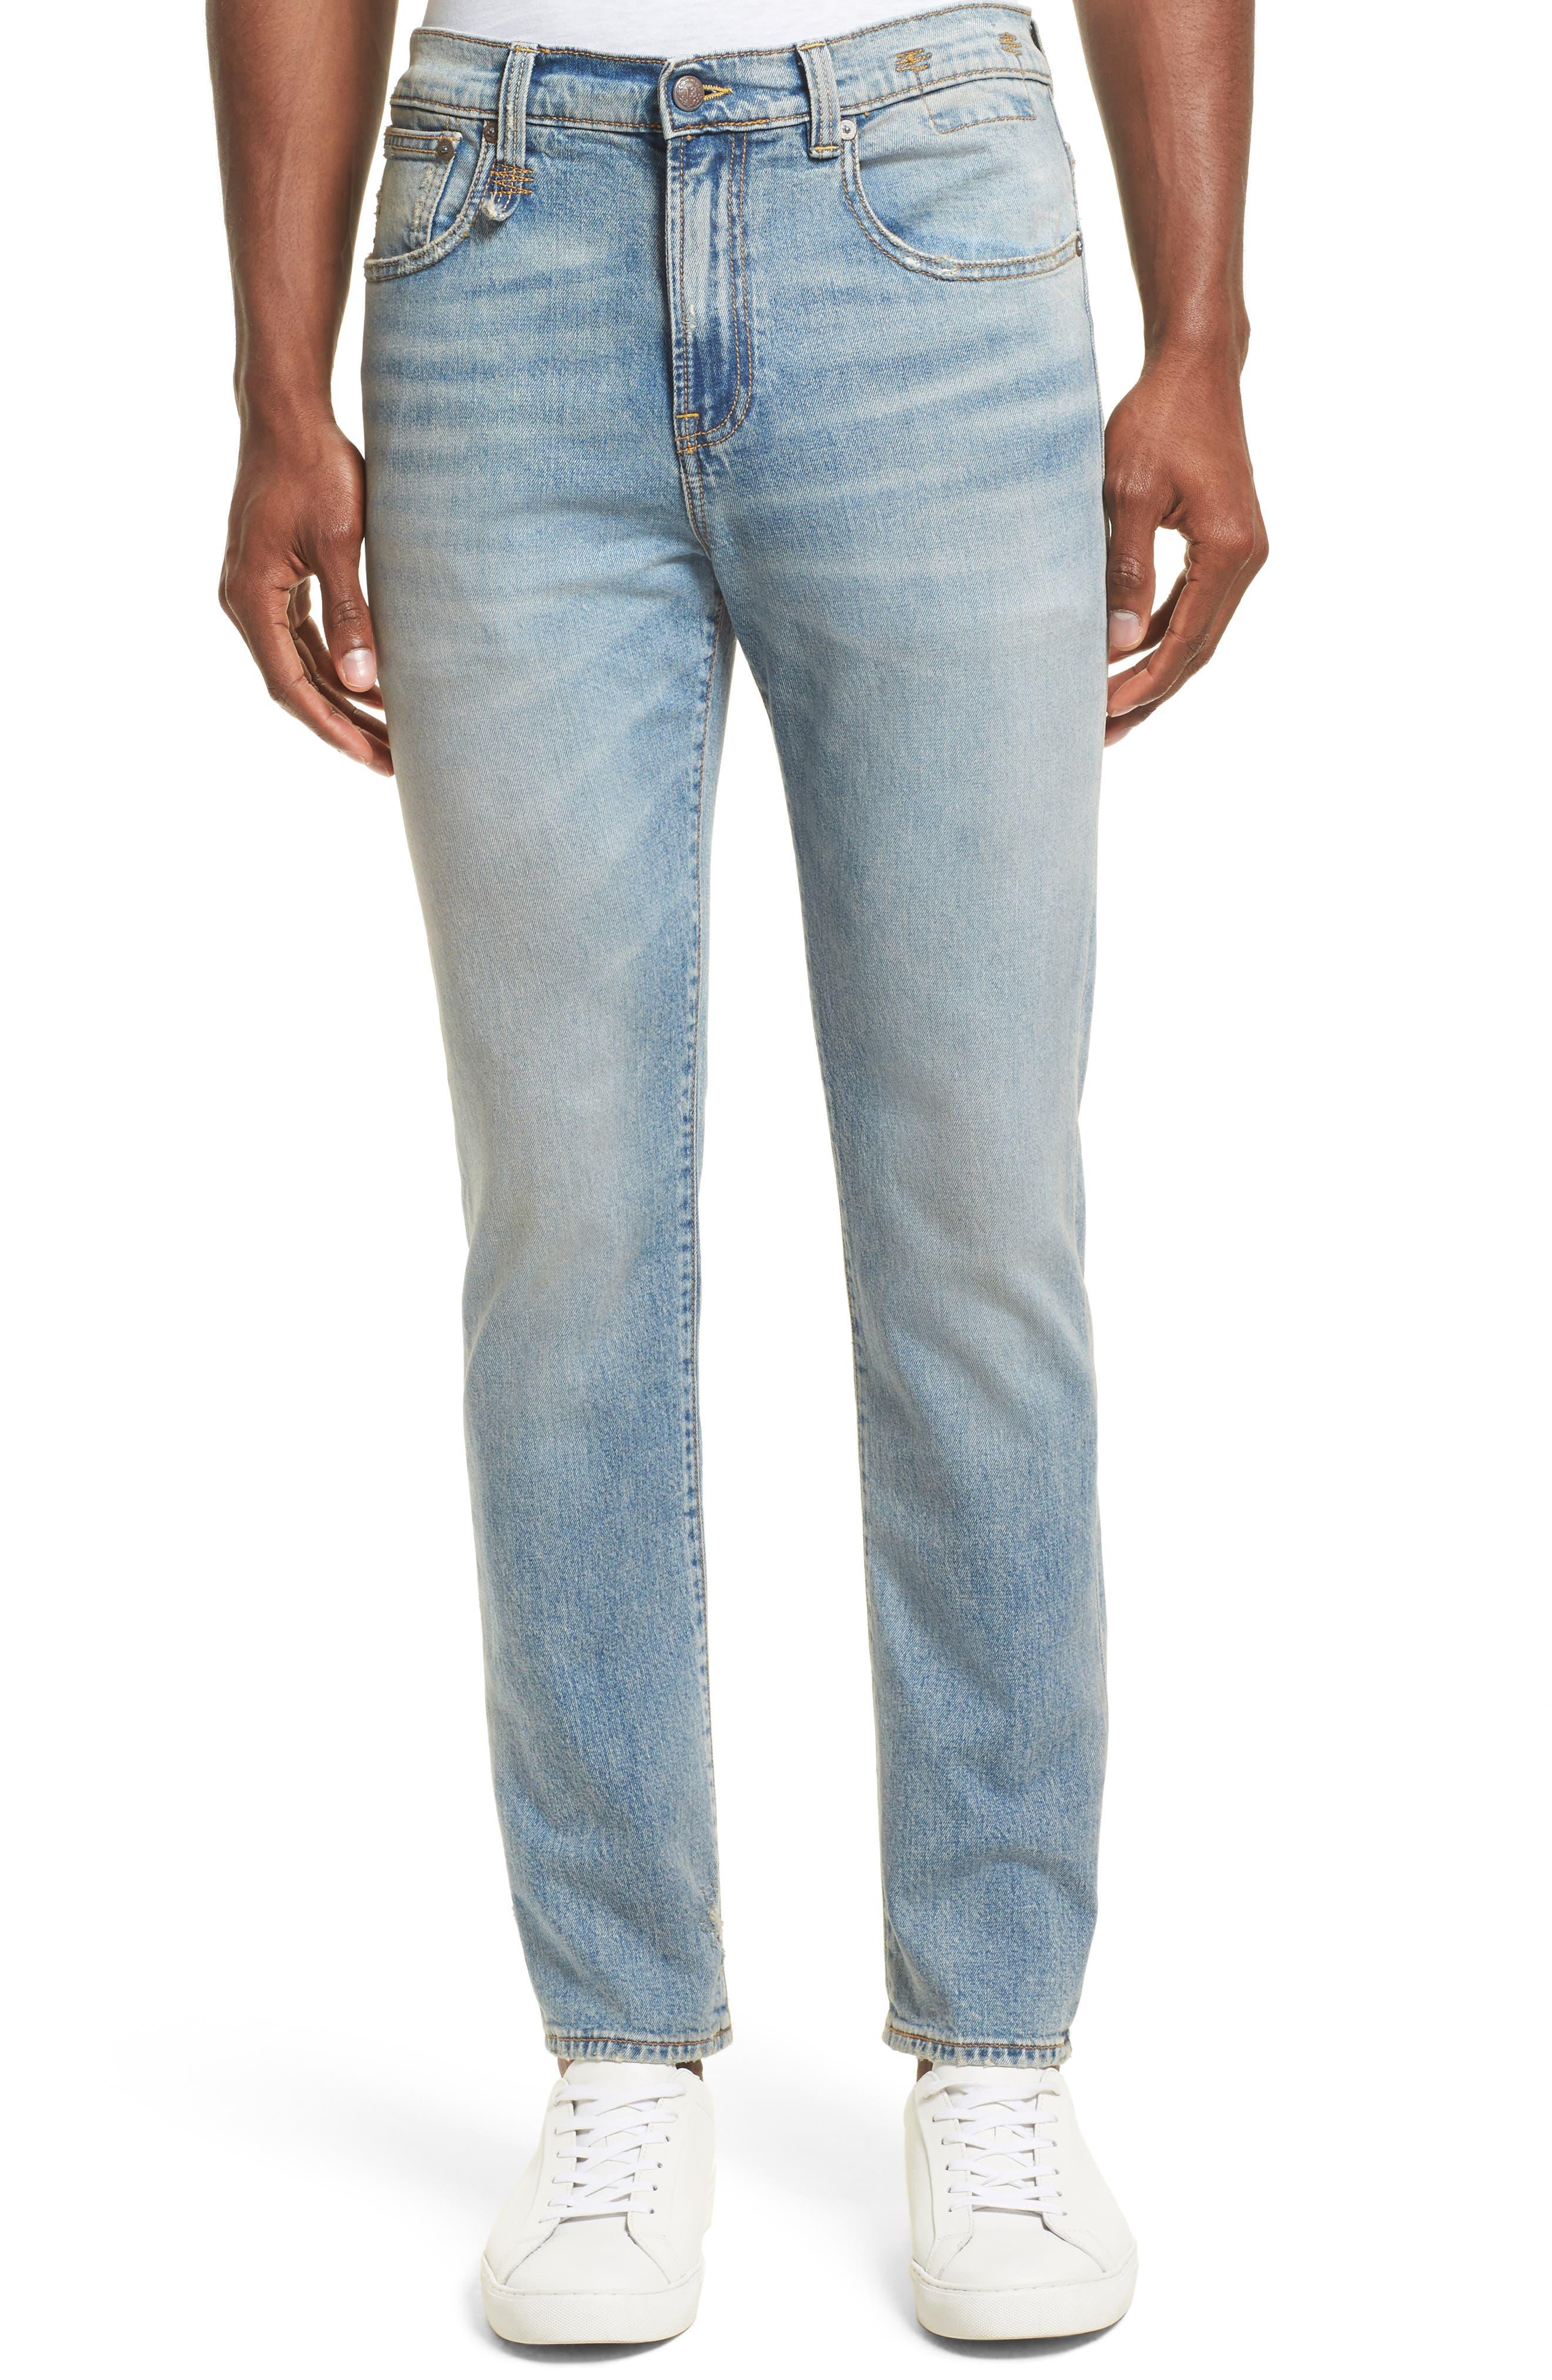 R13 Boy Clean Jeans